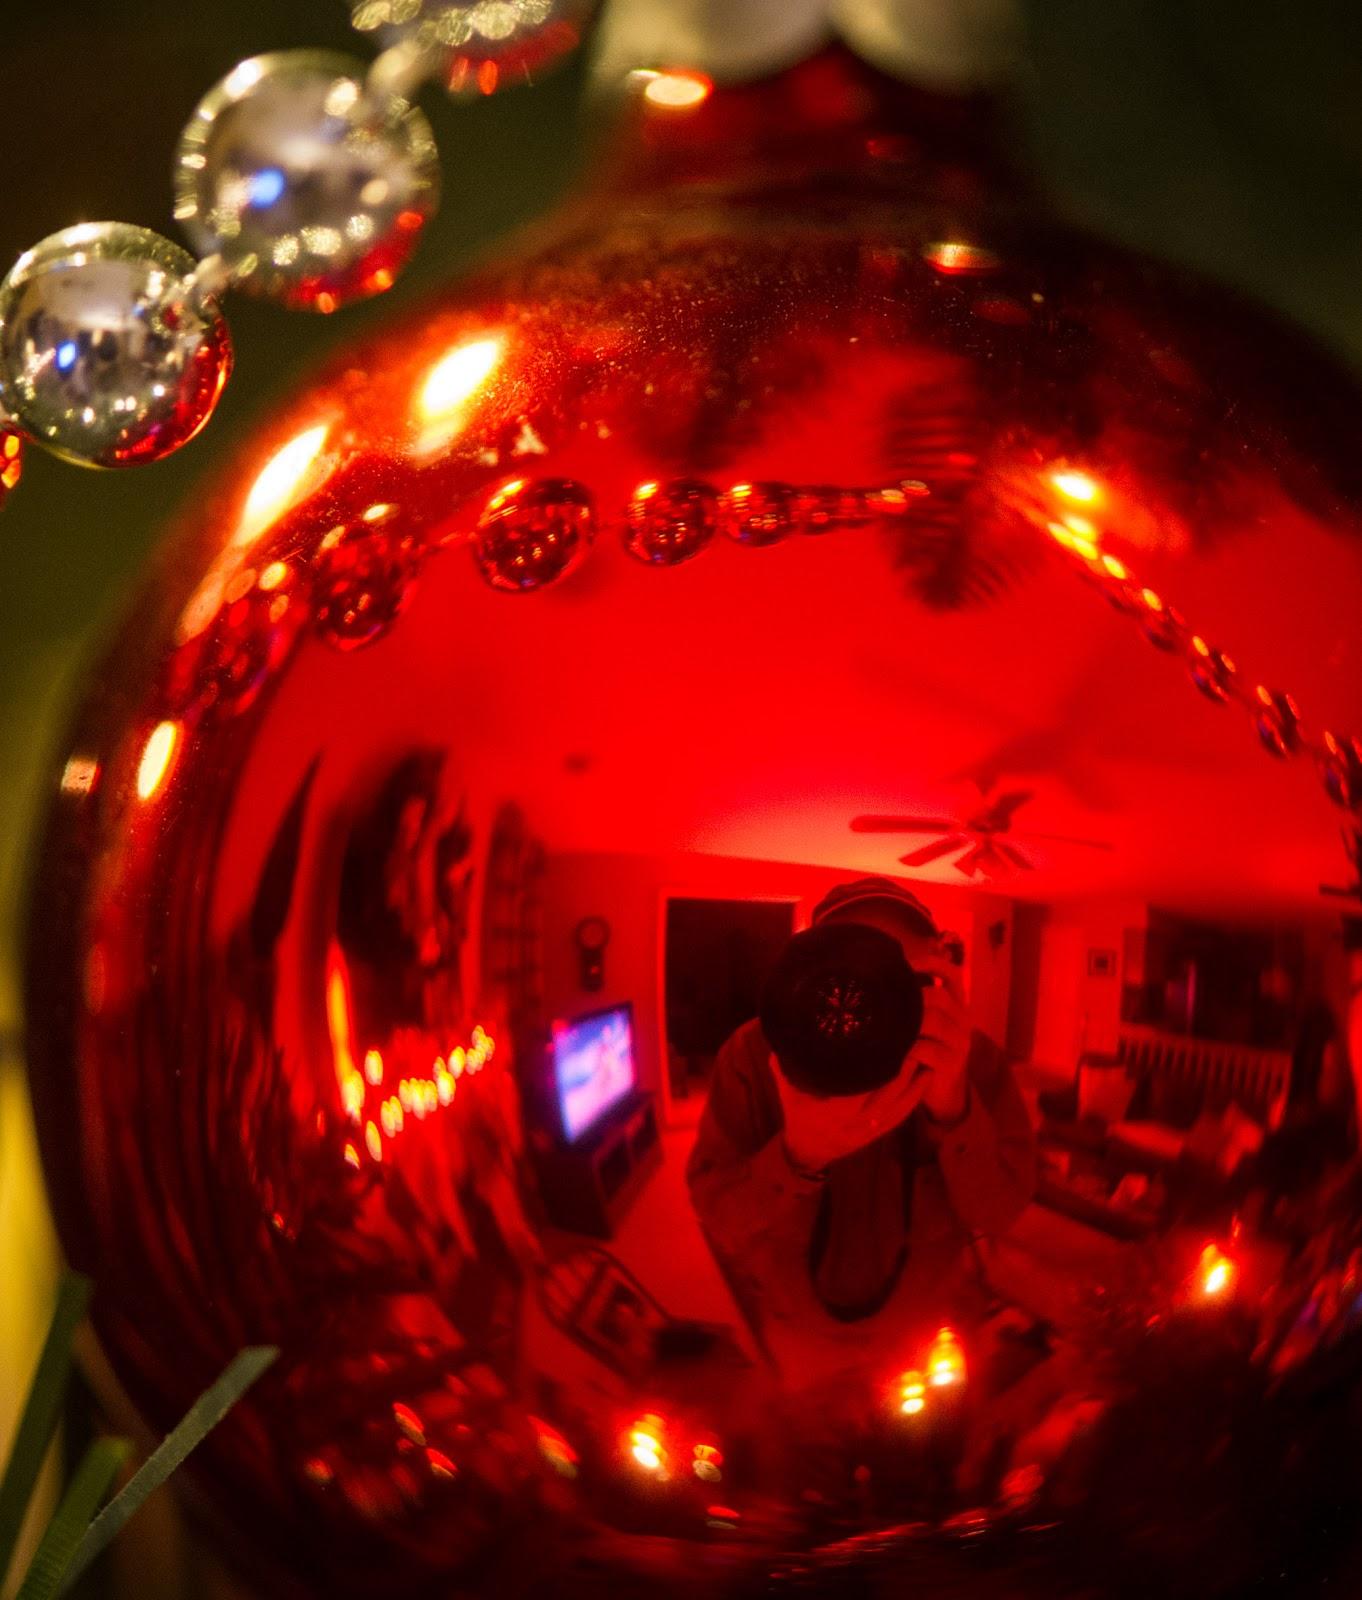 Photographing Christmas Lights - capturing that Kodak moment ...